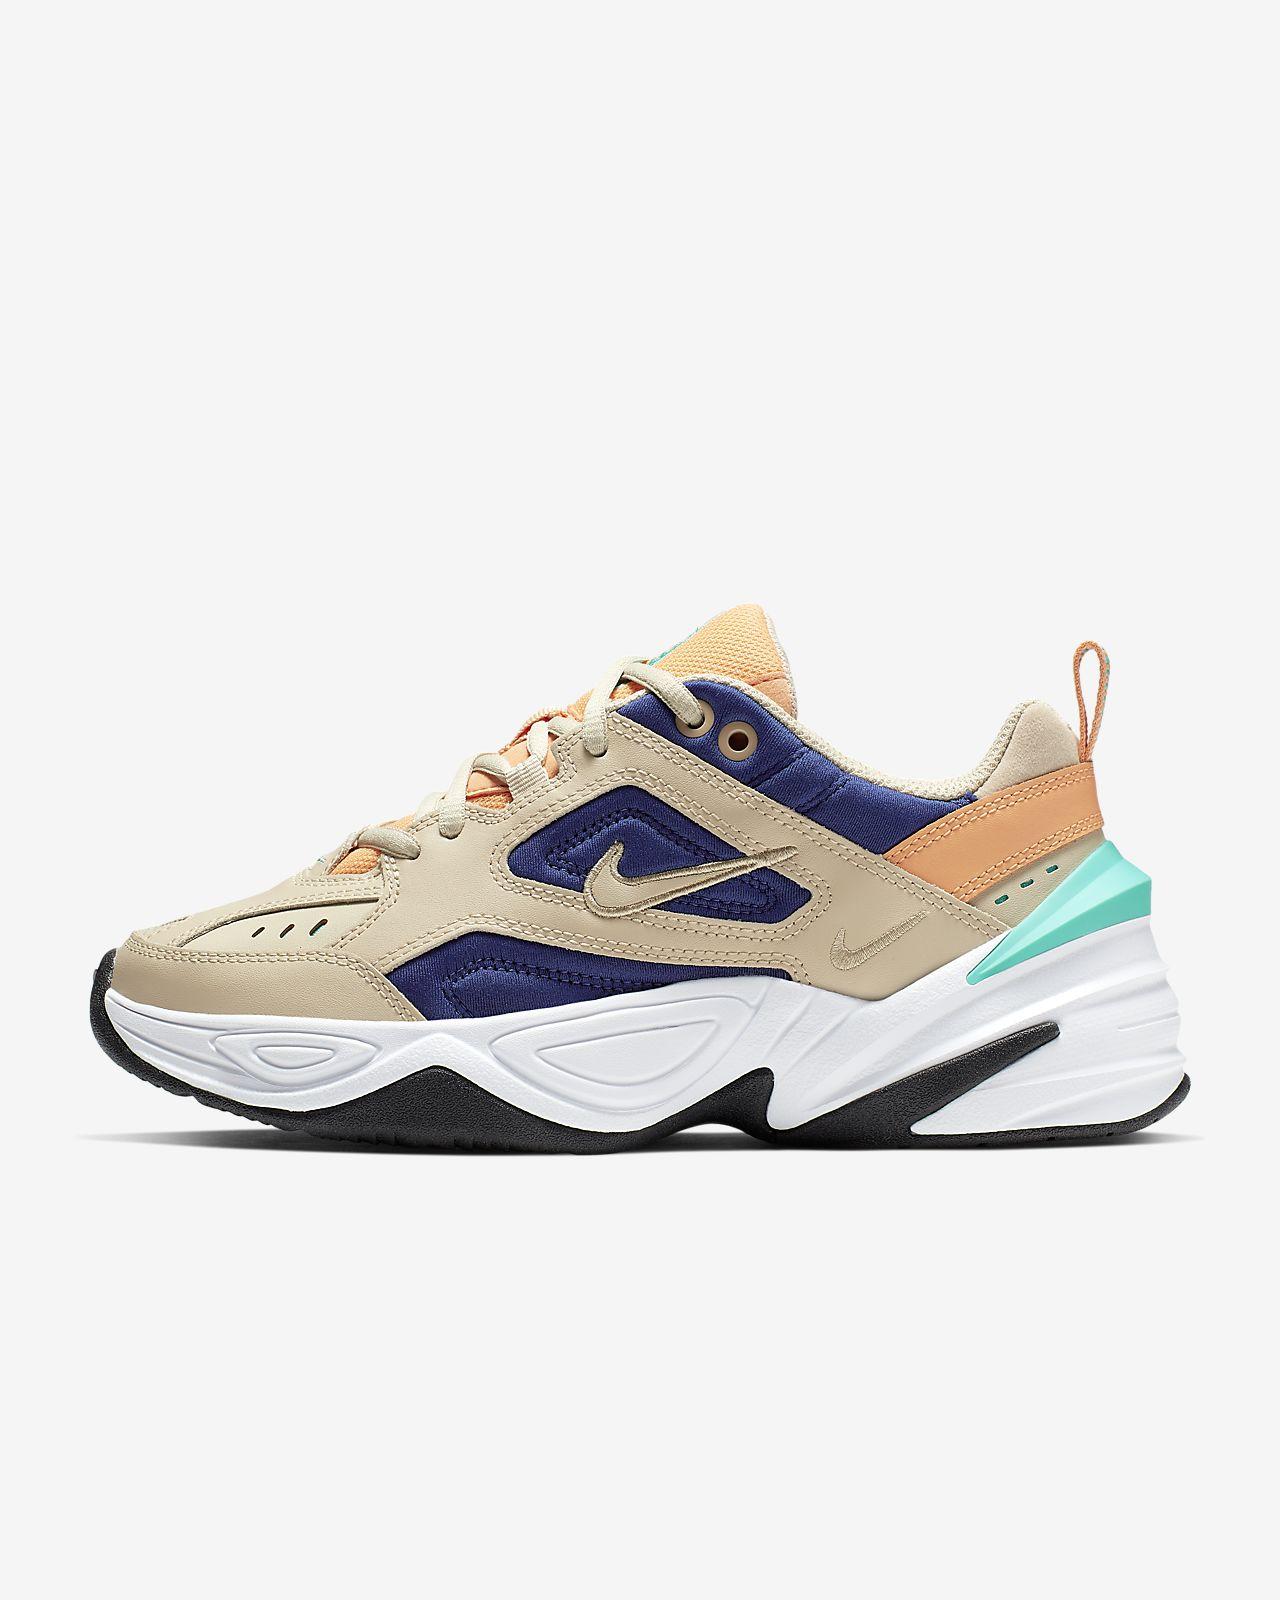 7551f5607277 Low Resolution Nike M2K Tekno cipő Nike M2K Tekno cipő